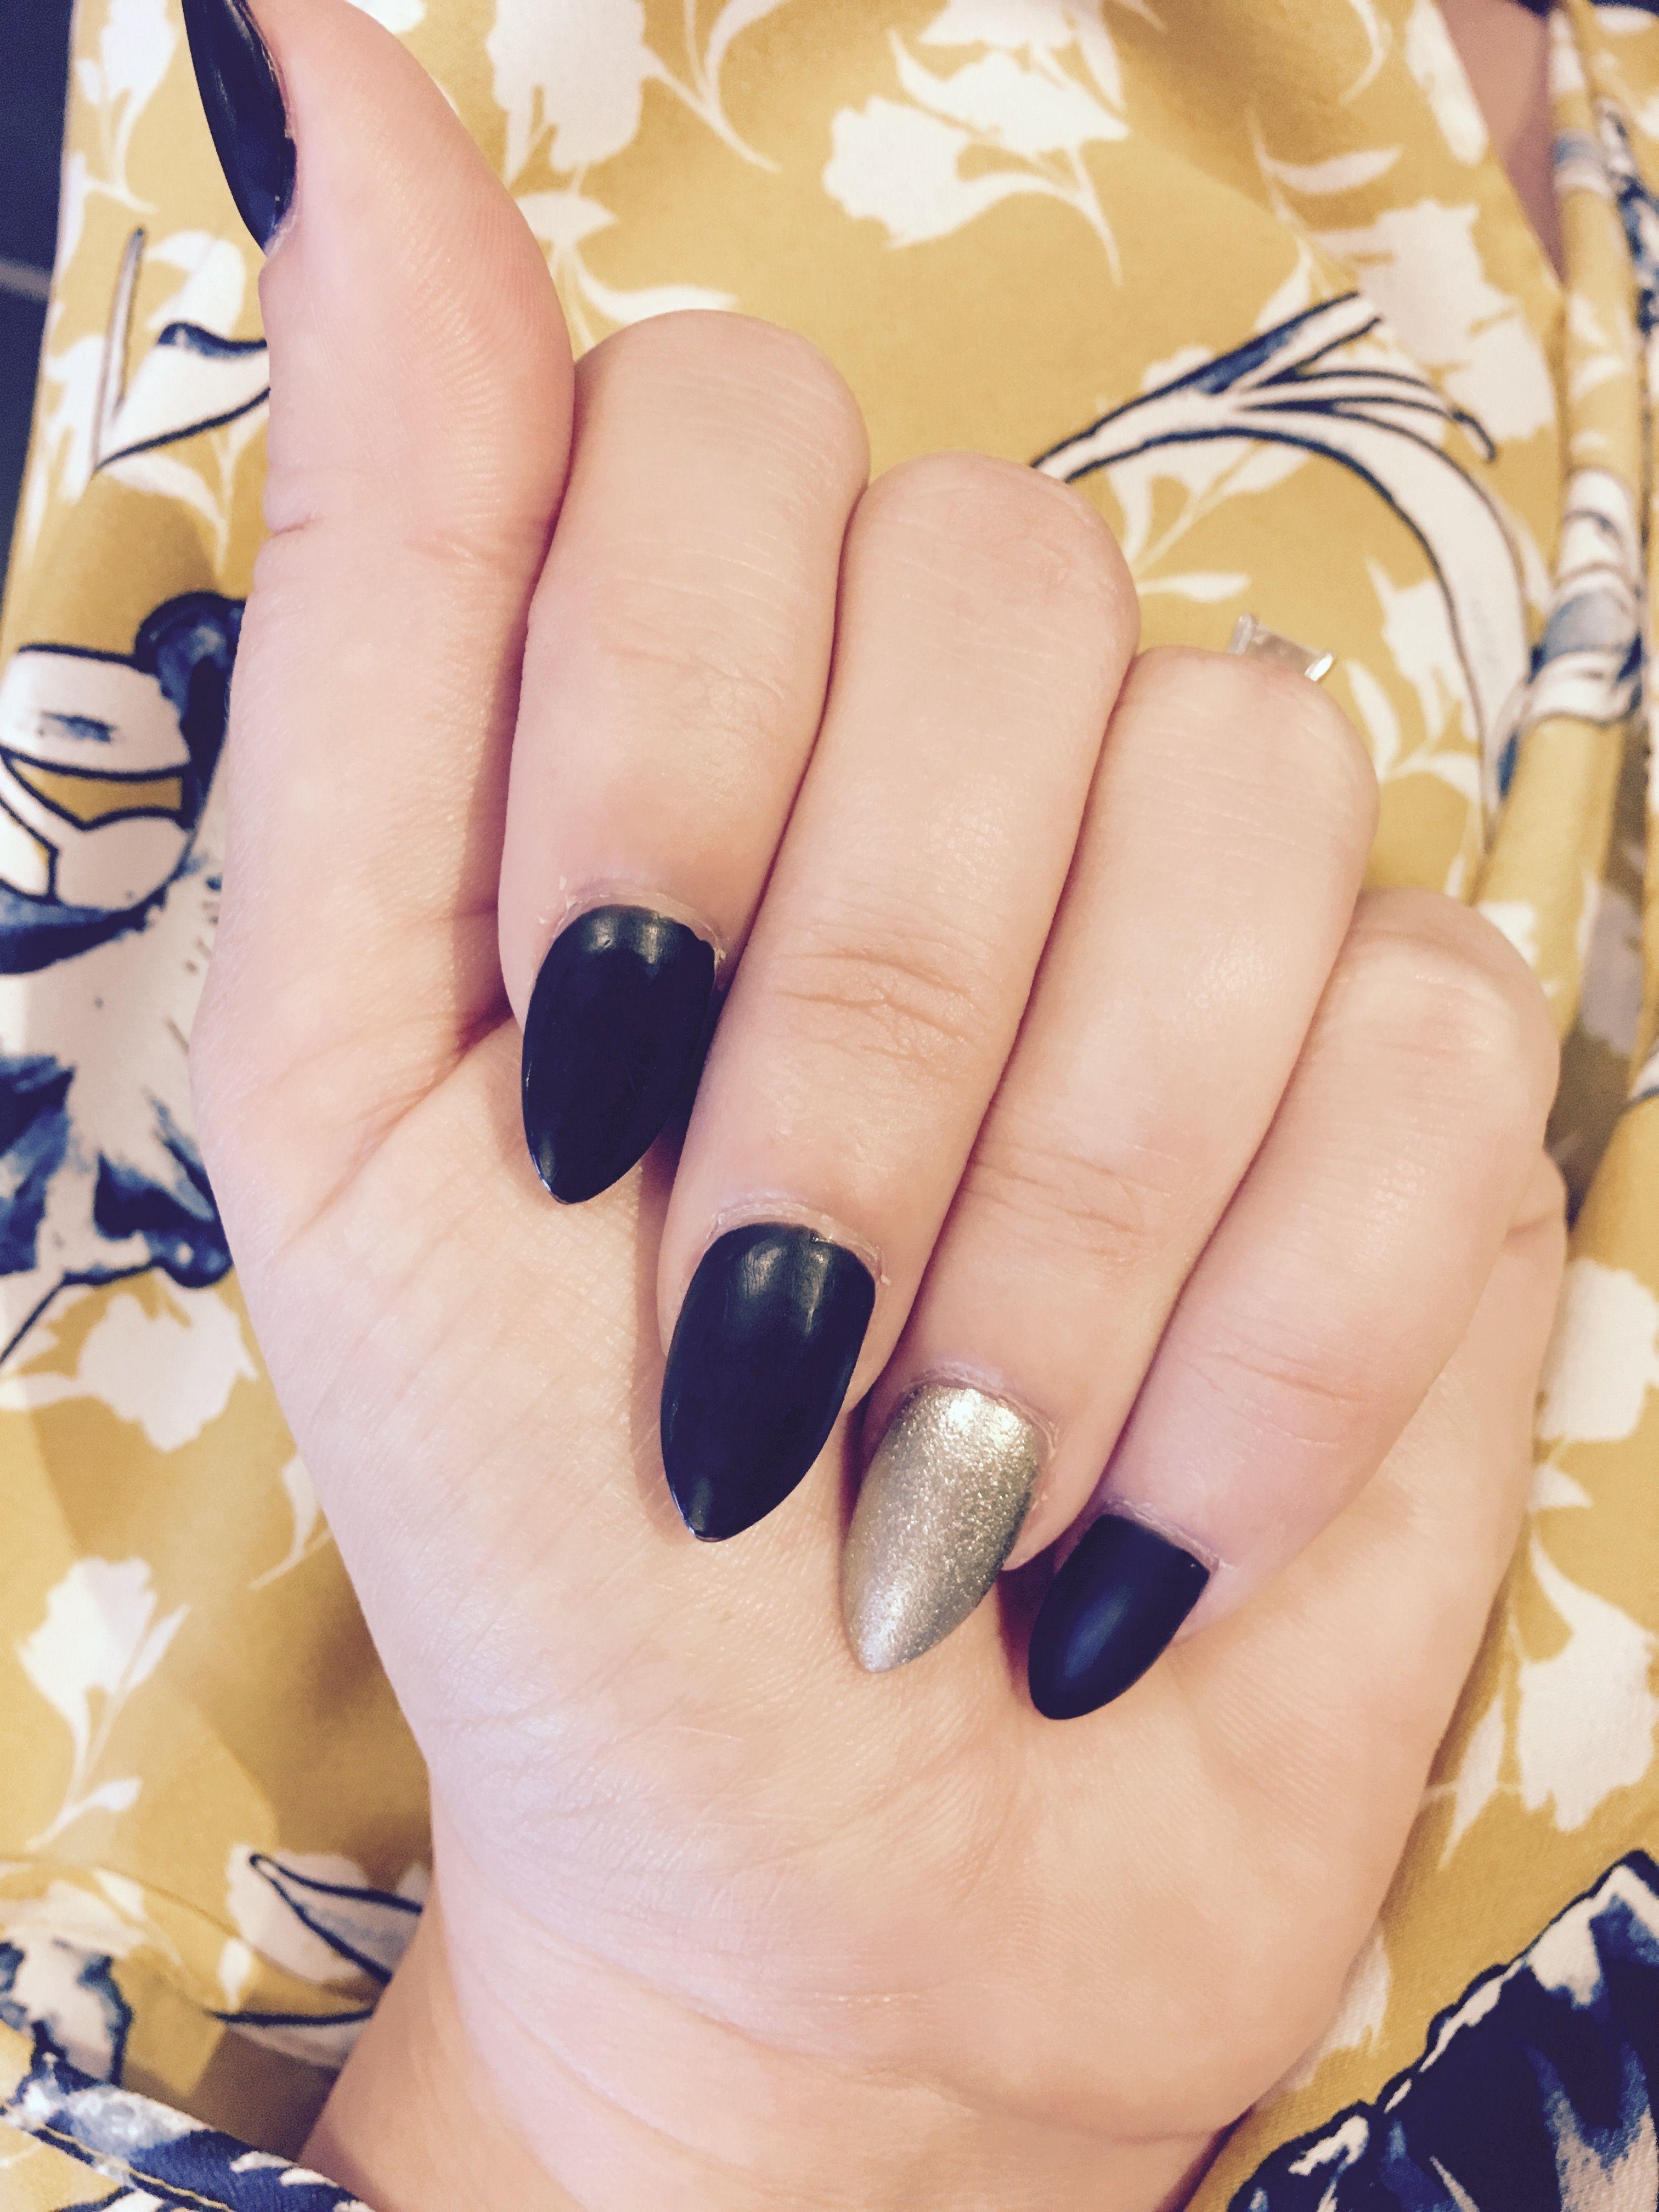 Tootsie Roll Matte Mountain Peak Nails Nails Pinterest Pedicures